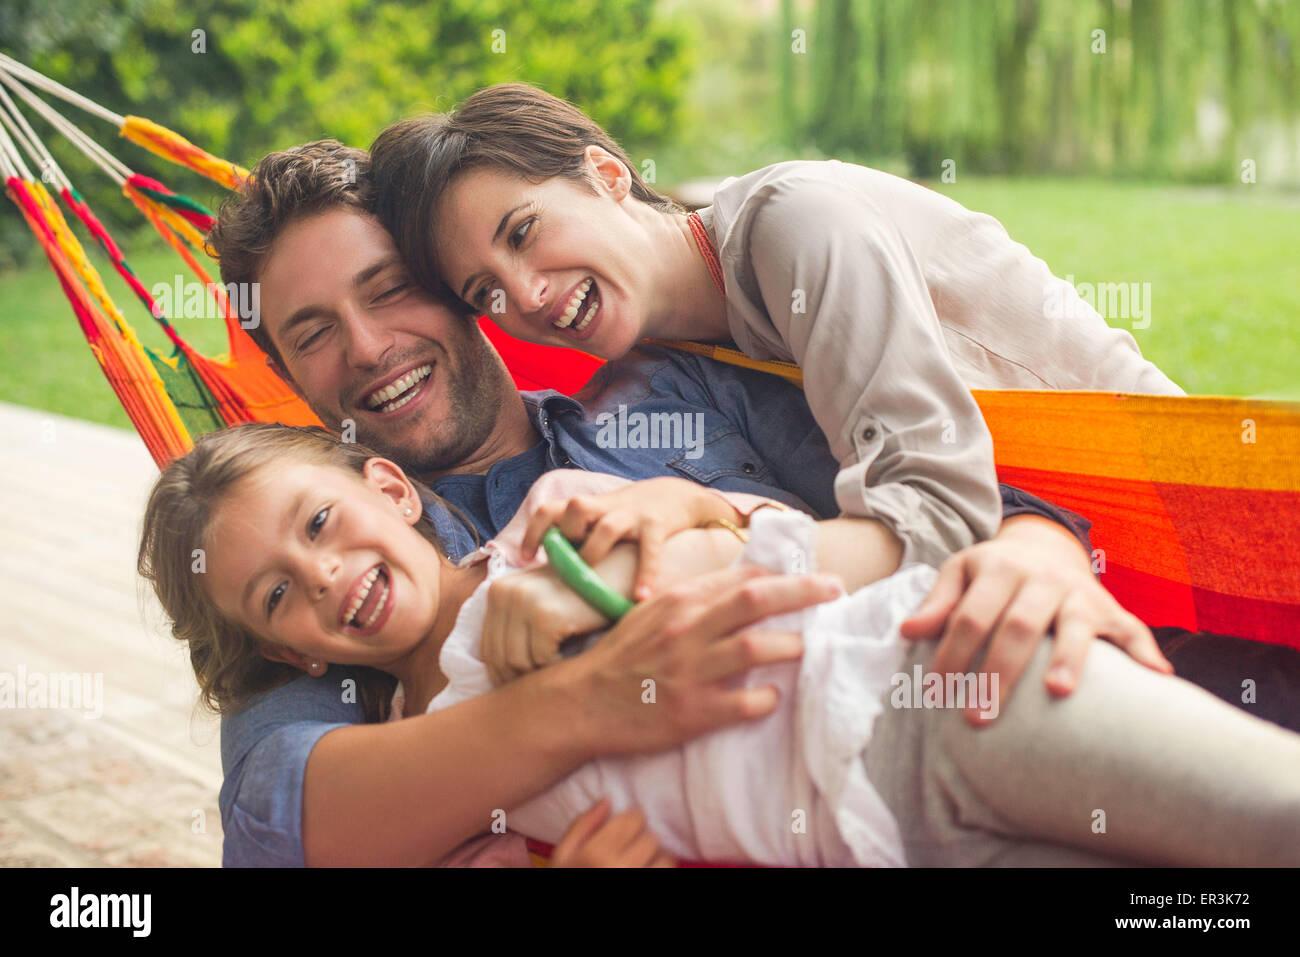 Jugar en familia hamaca Imagen De Stock